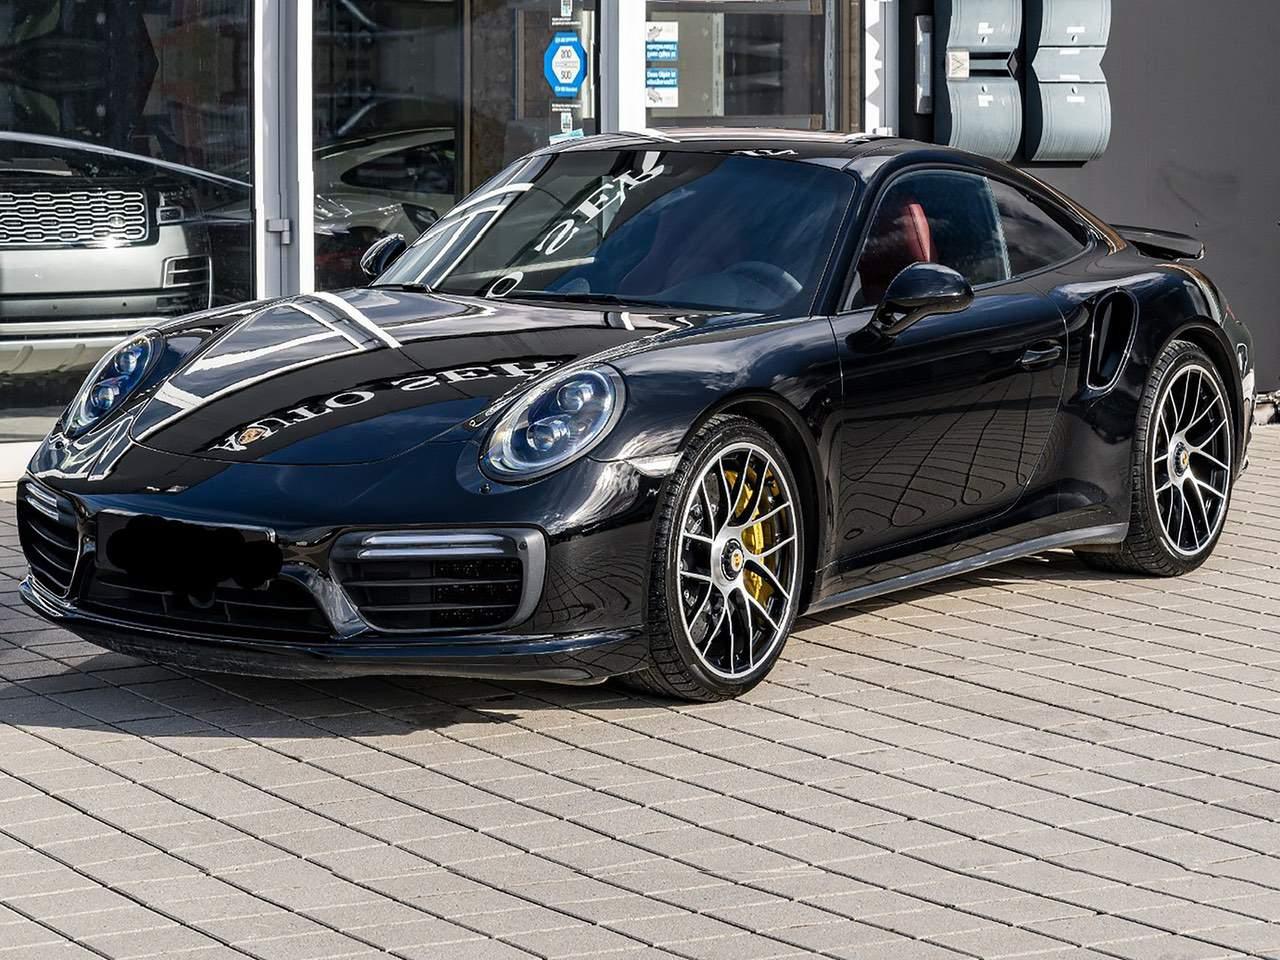 Porsche-911-Turbo-S-12